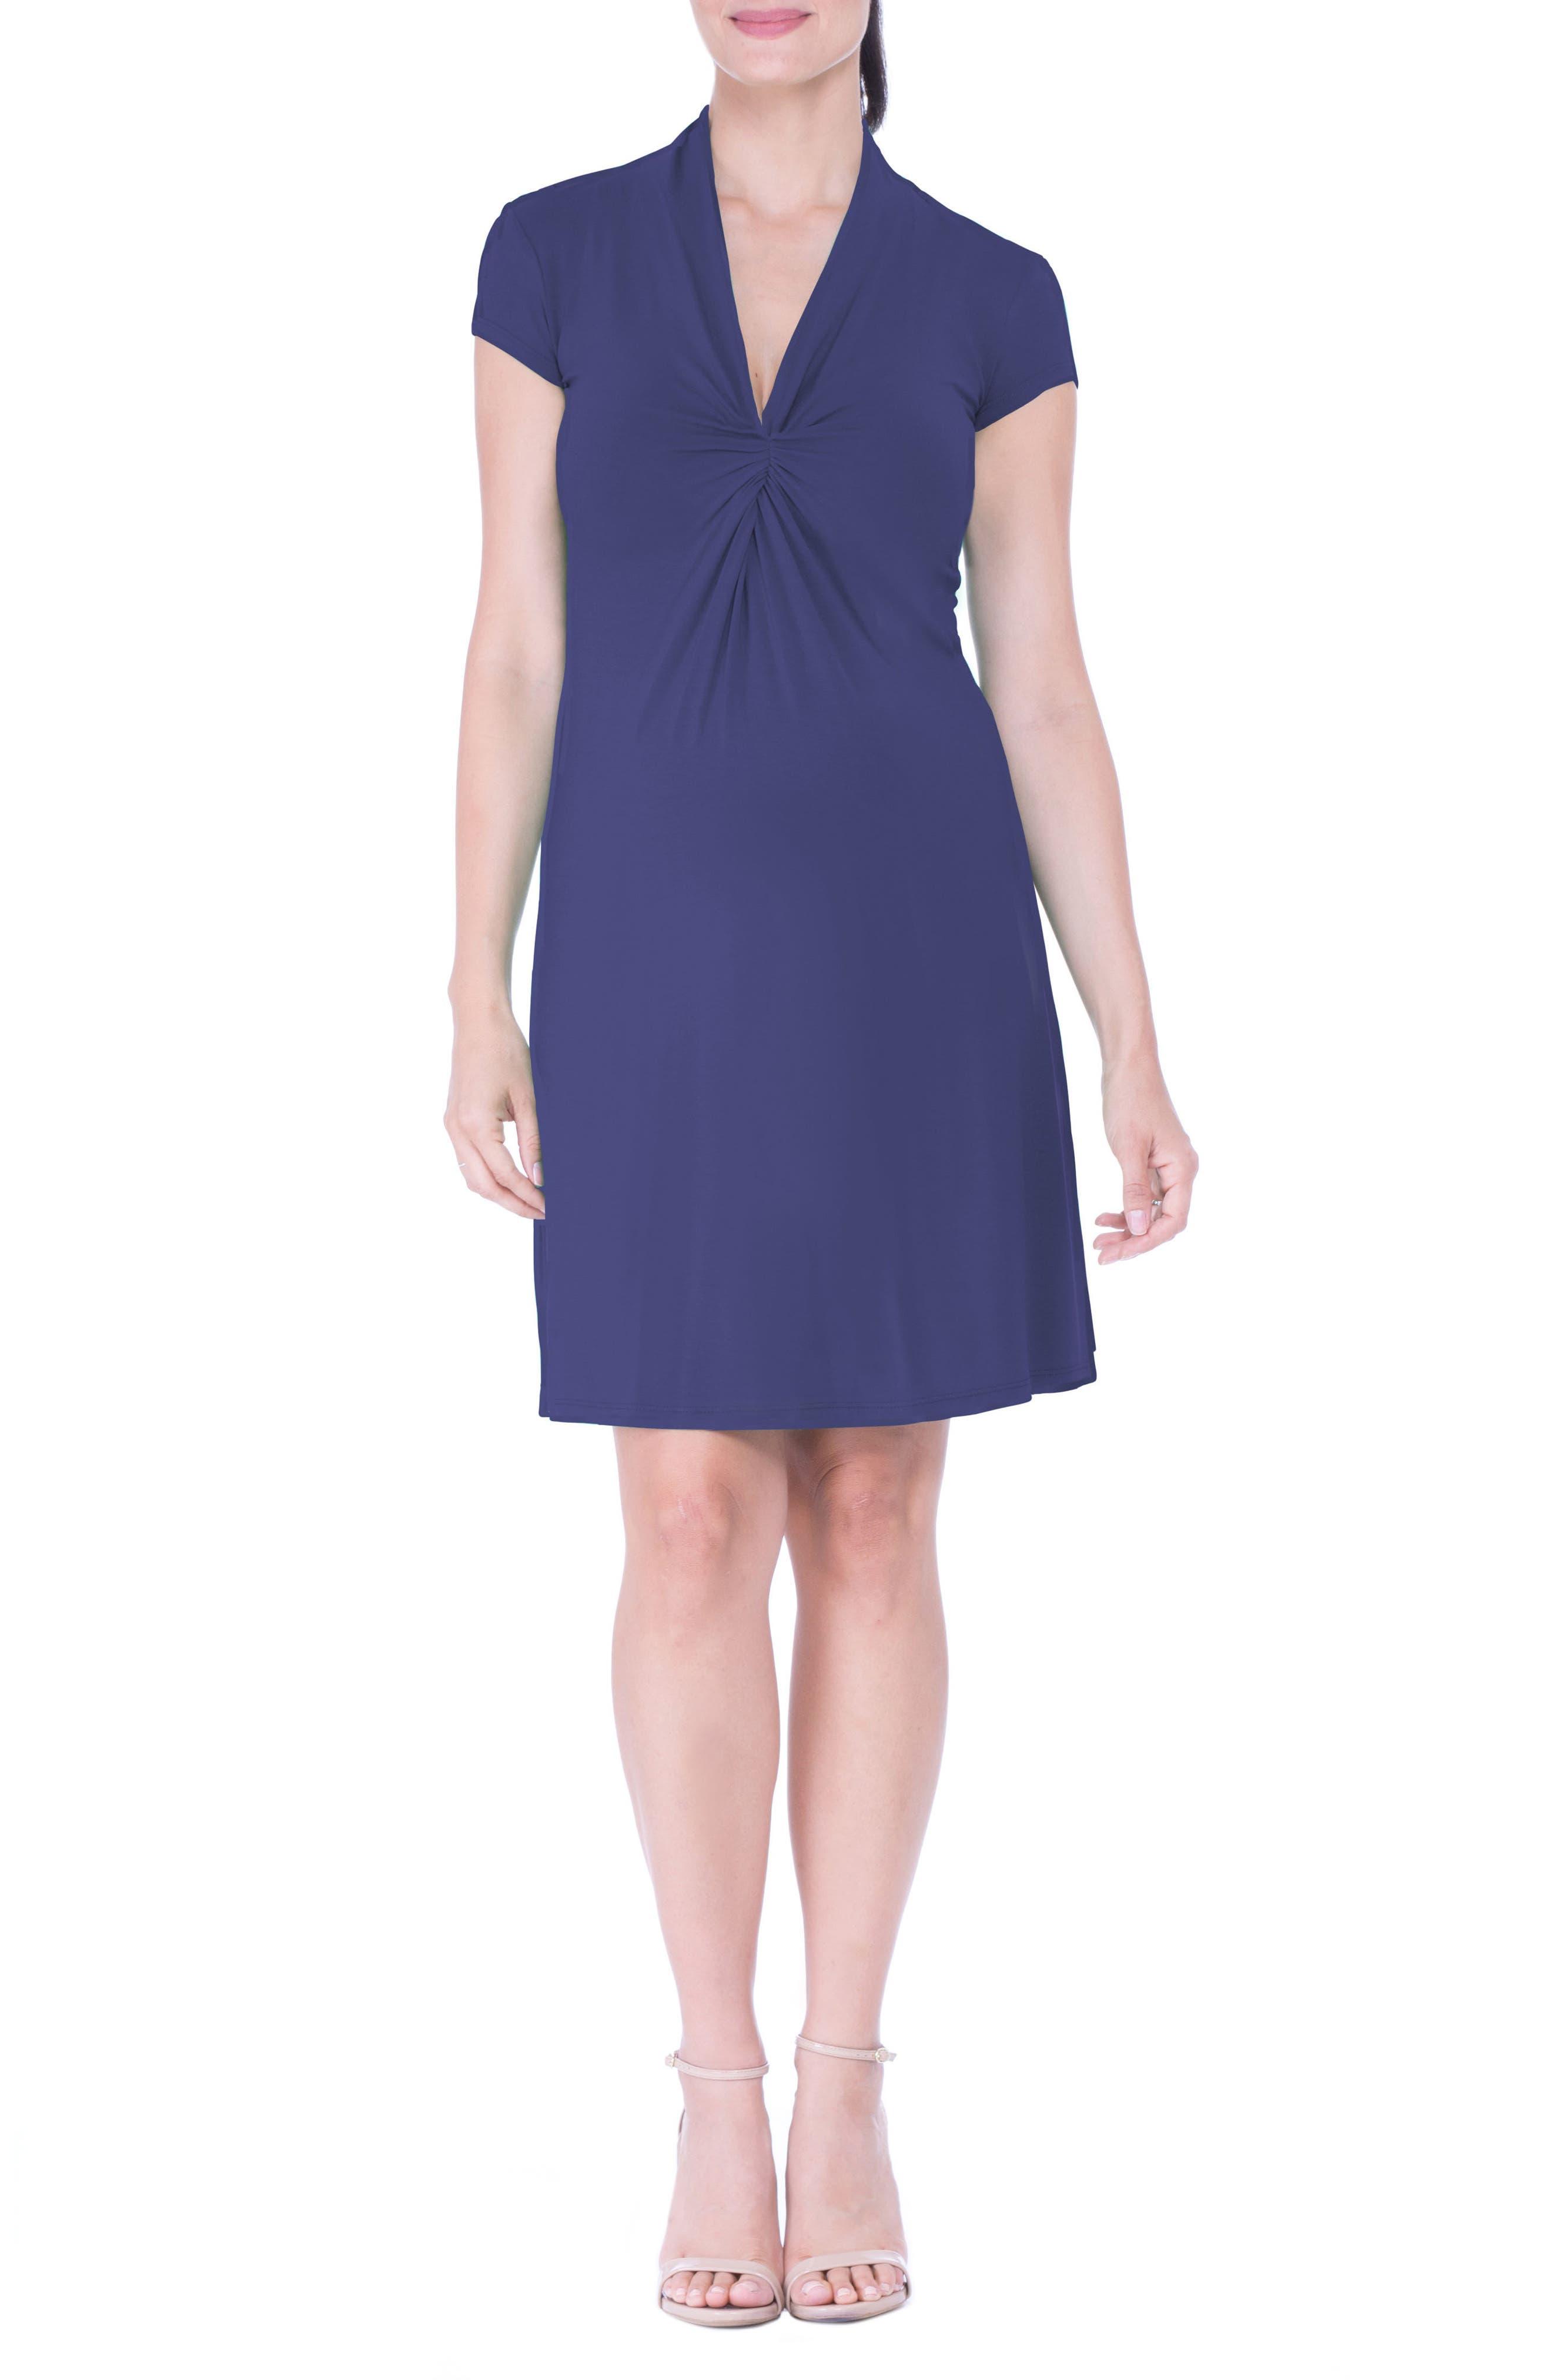 Alternate Image 1 Selected - Olian Maternity Wrap Dress